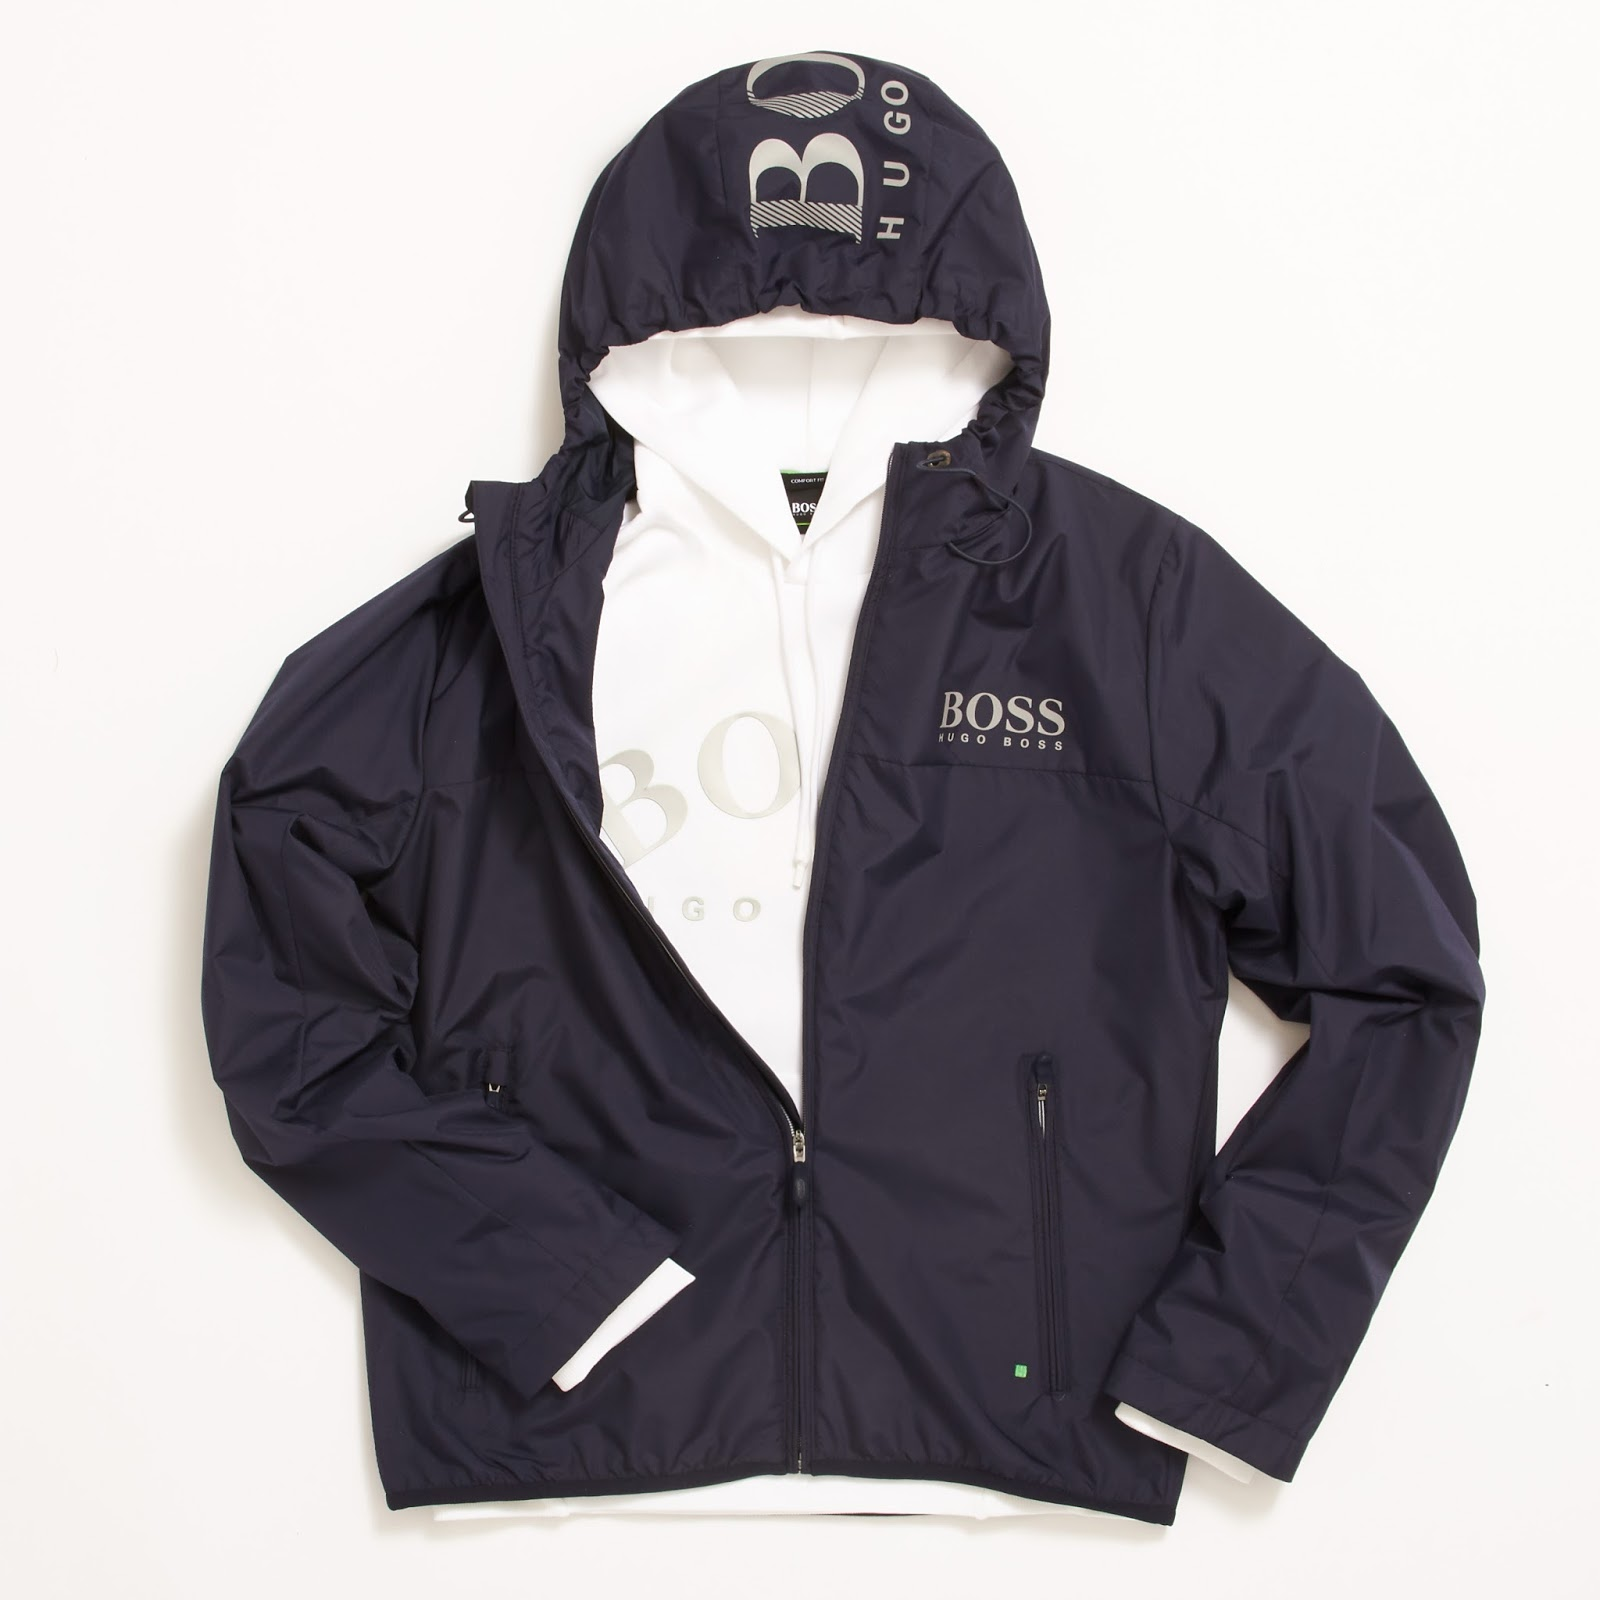 b7dca4ff8 Hugo Boss Athleisure Jeltech Black Jacket - £249 / Red Sly hoody Sweatshirt  for £179